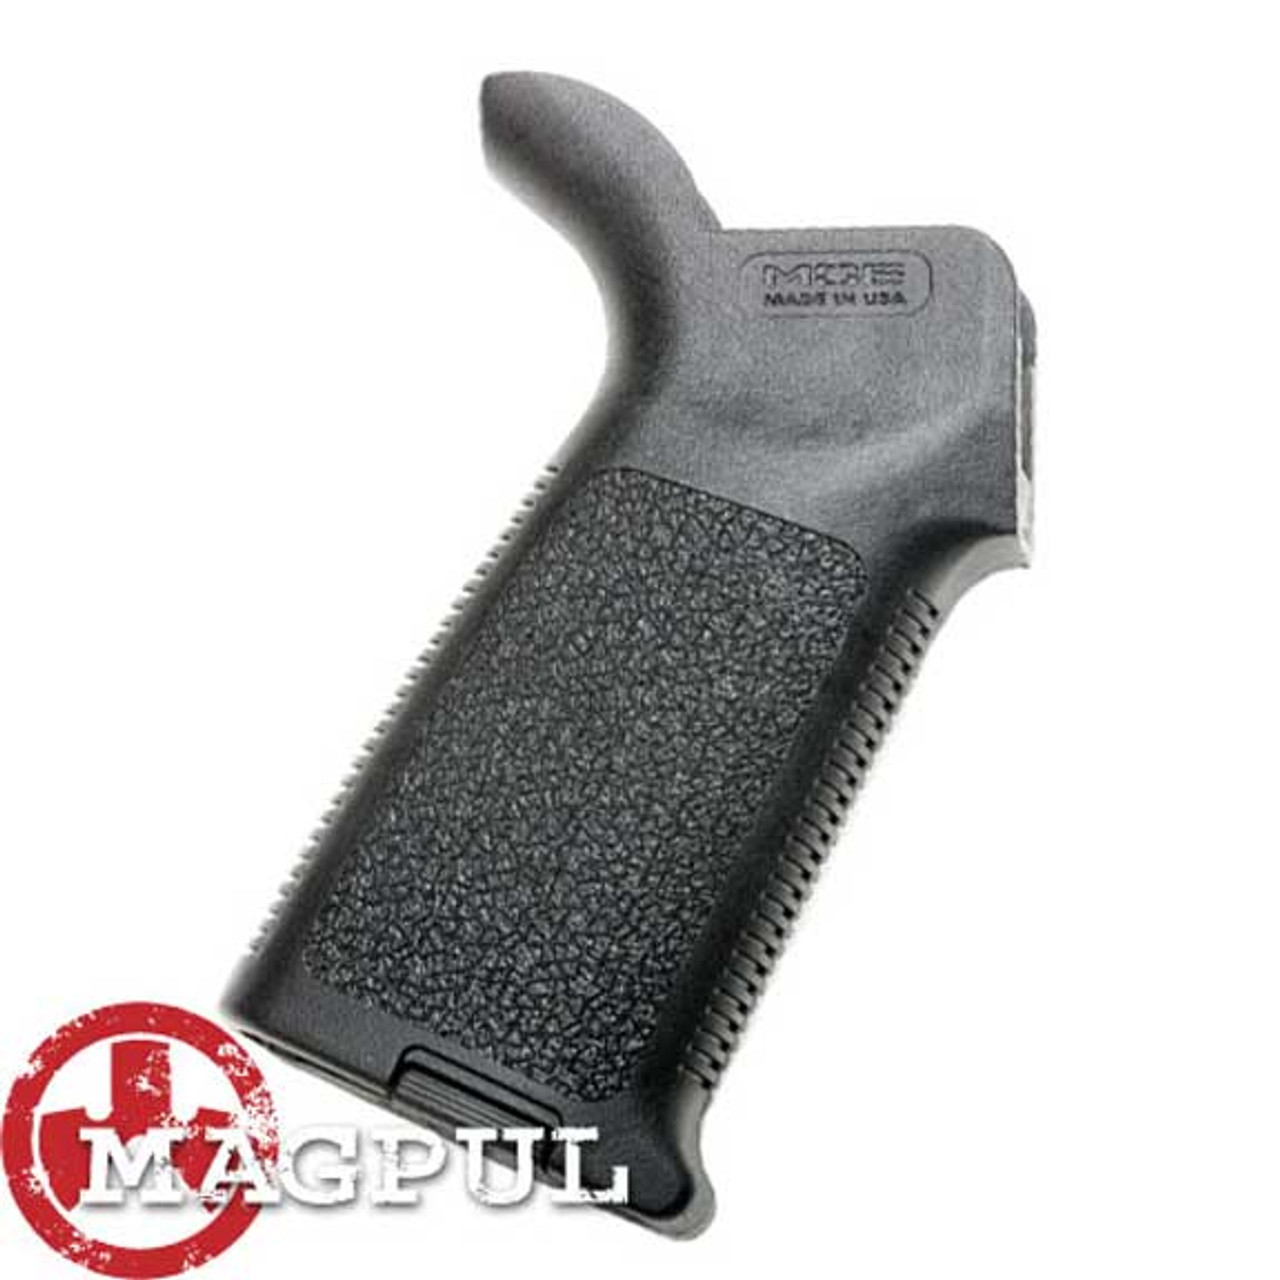 MagPul MOE Grip - Black